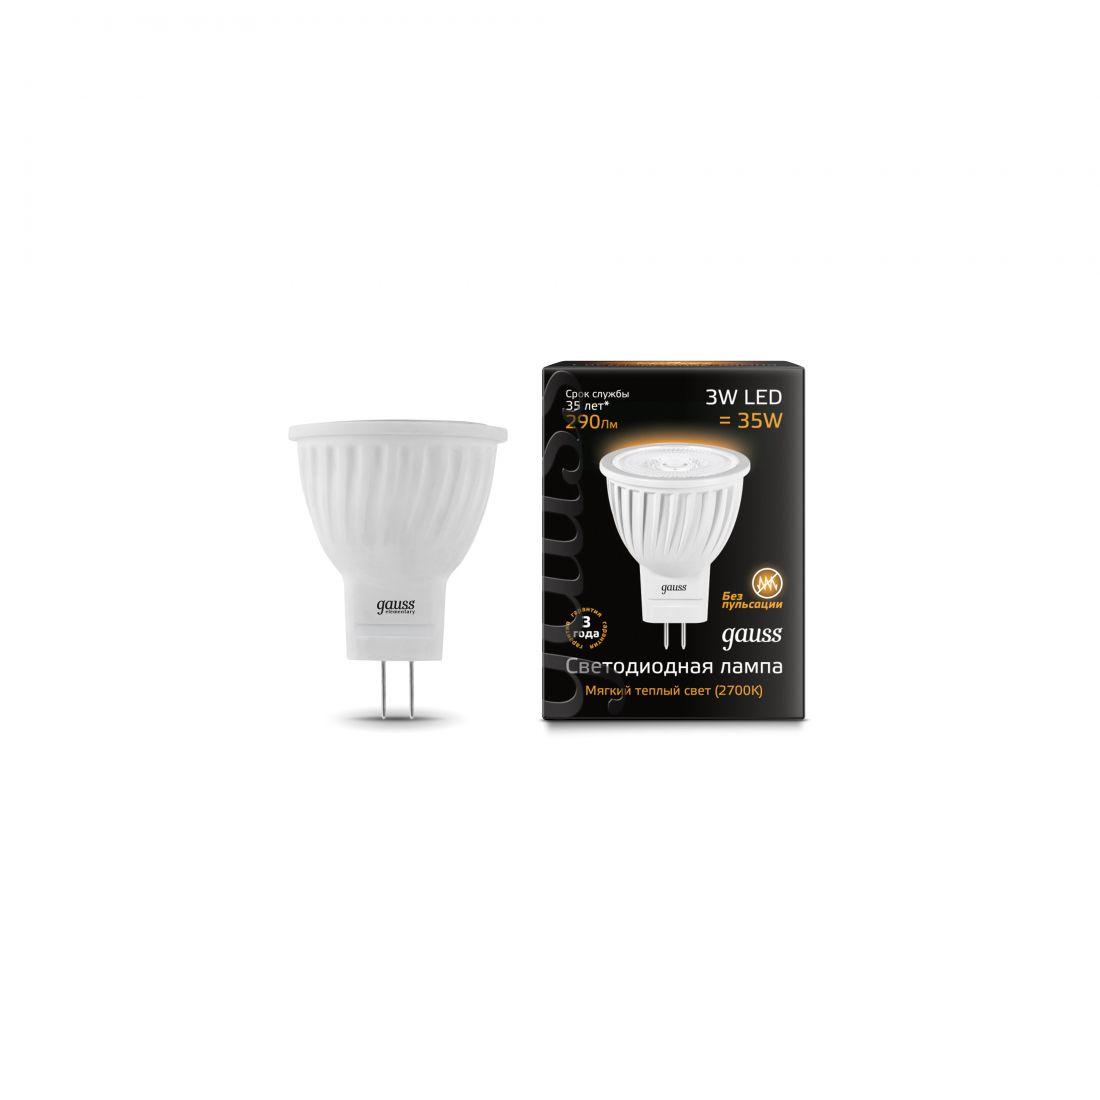 Лампа Gauss LED 3W MR11 GU4 220-240V 2700K